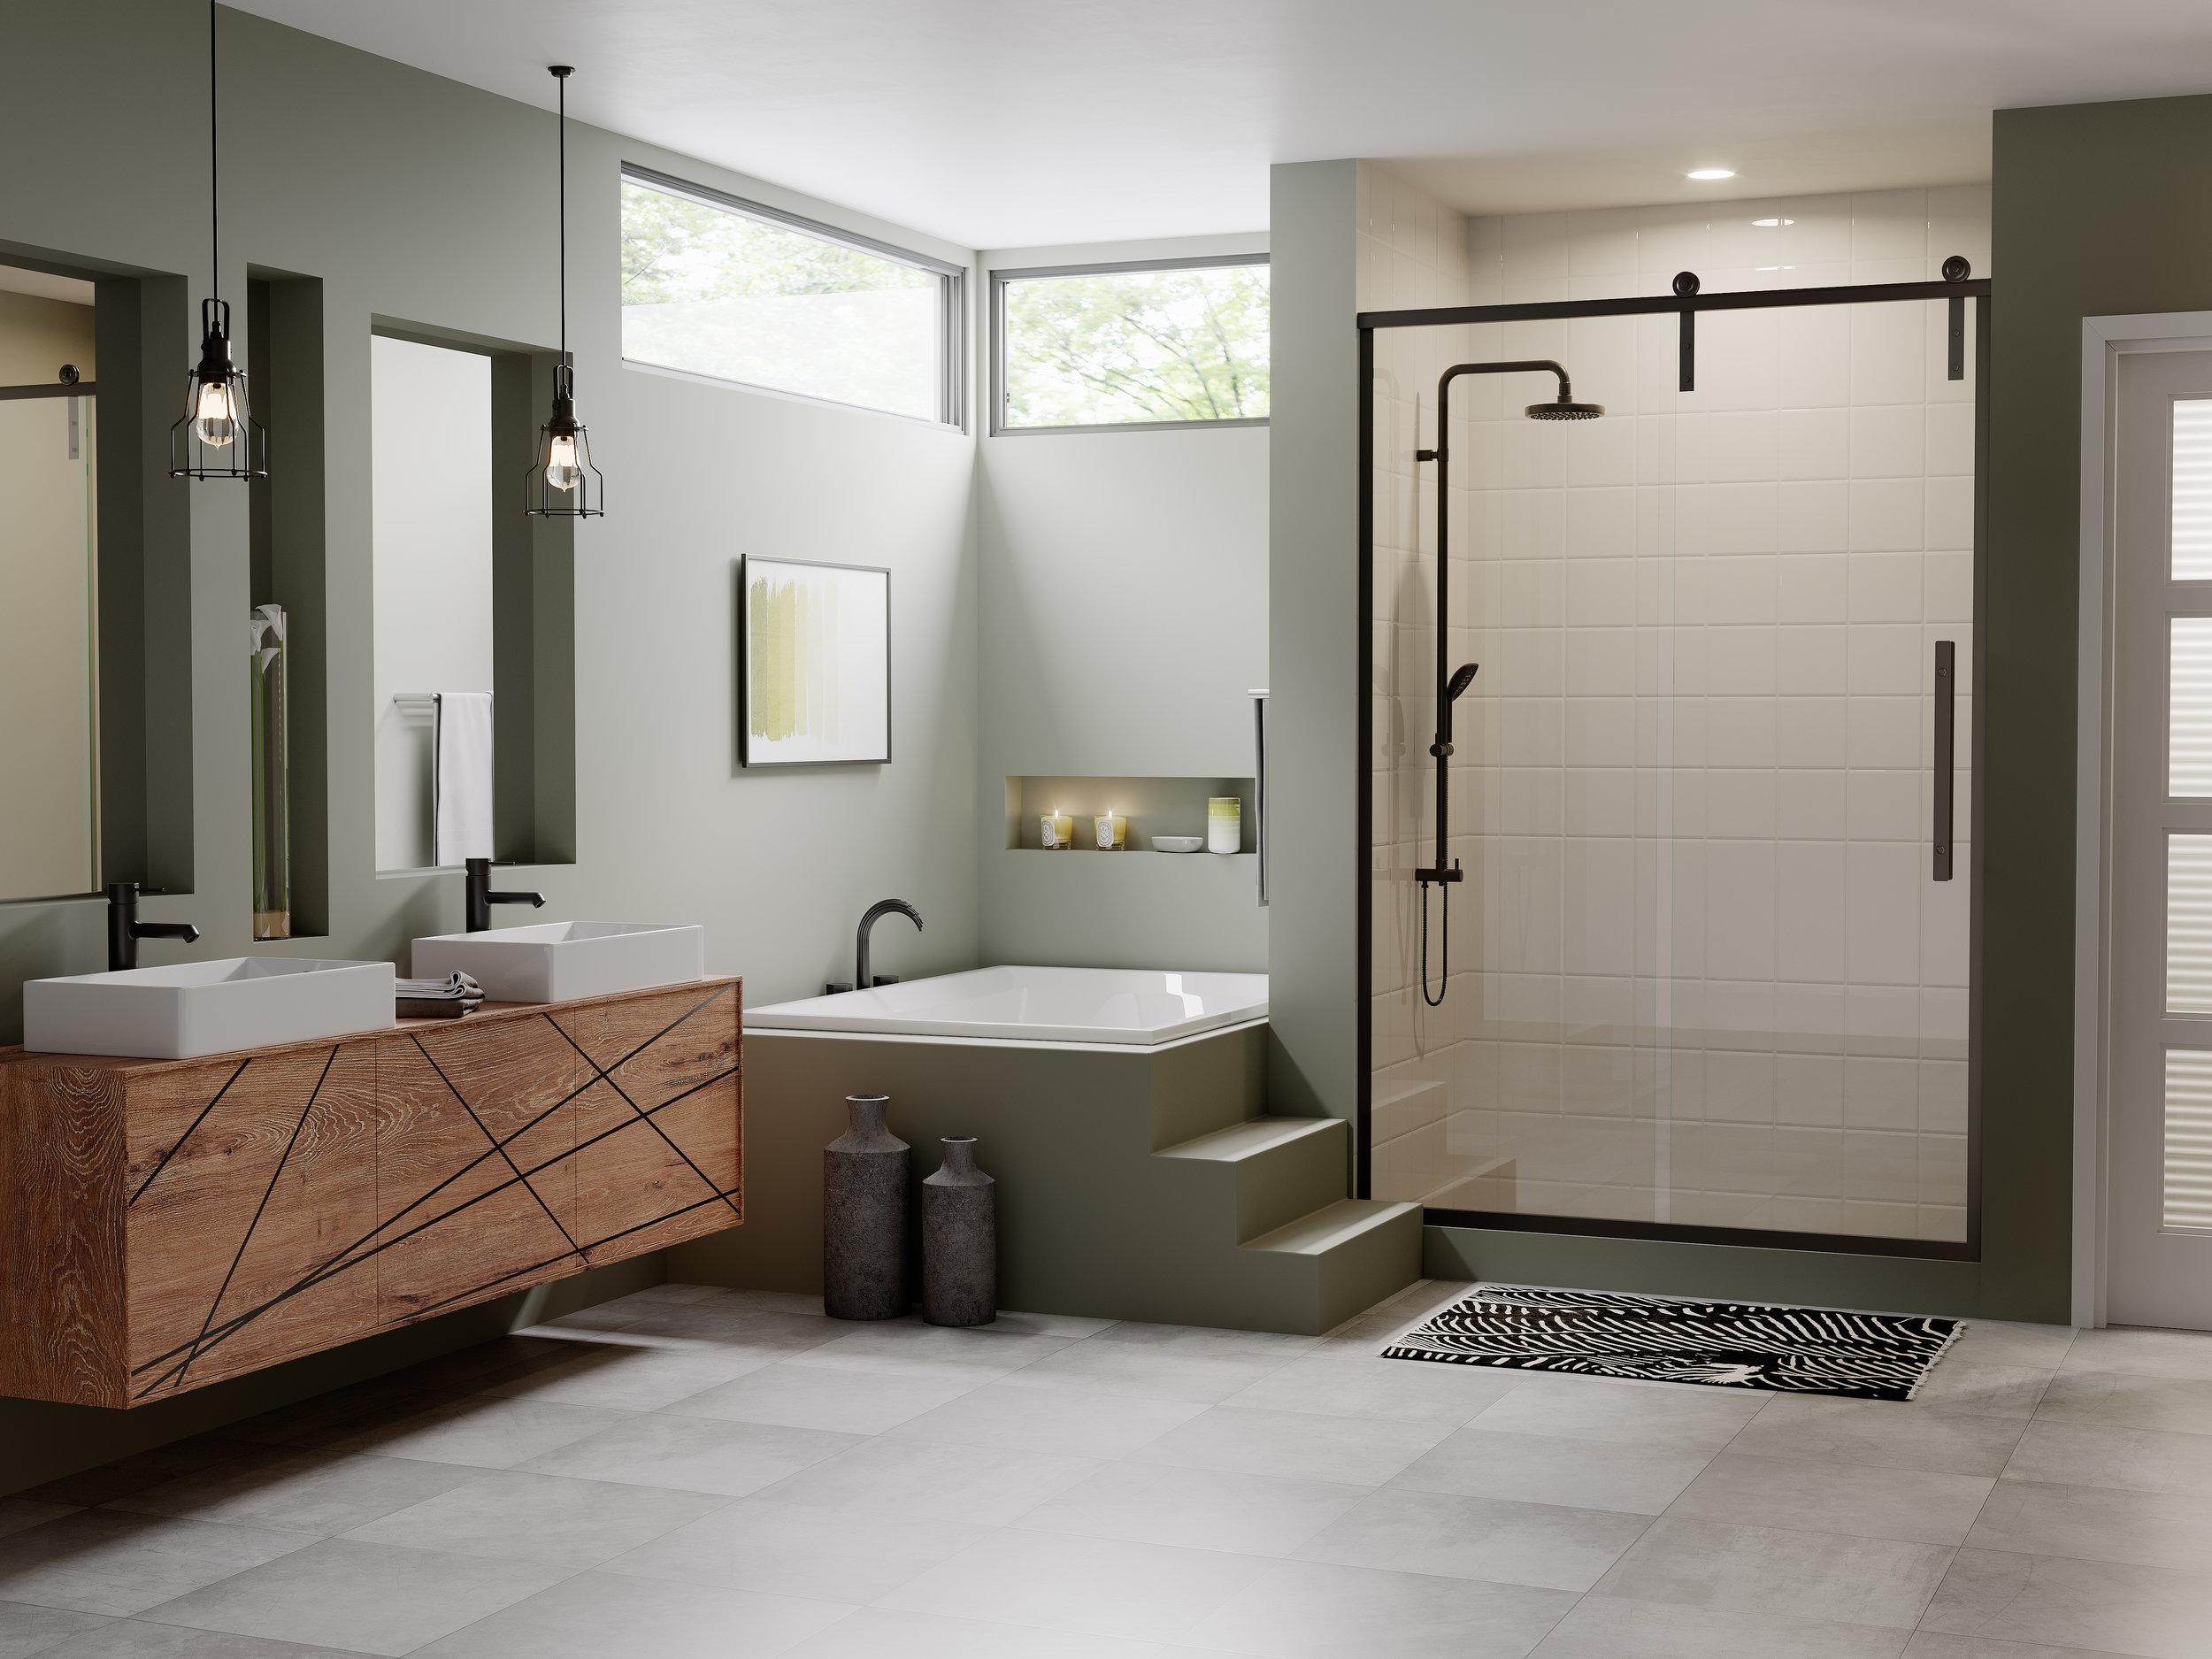 Ecplipse Country Bathroom 5K.jpg